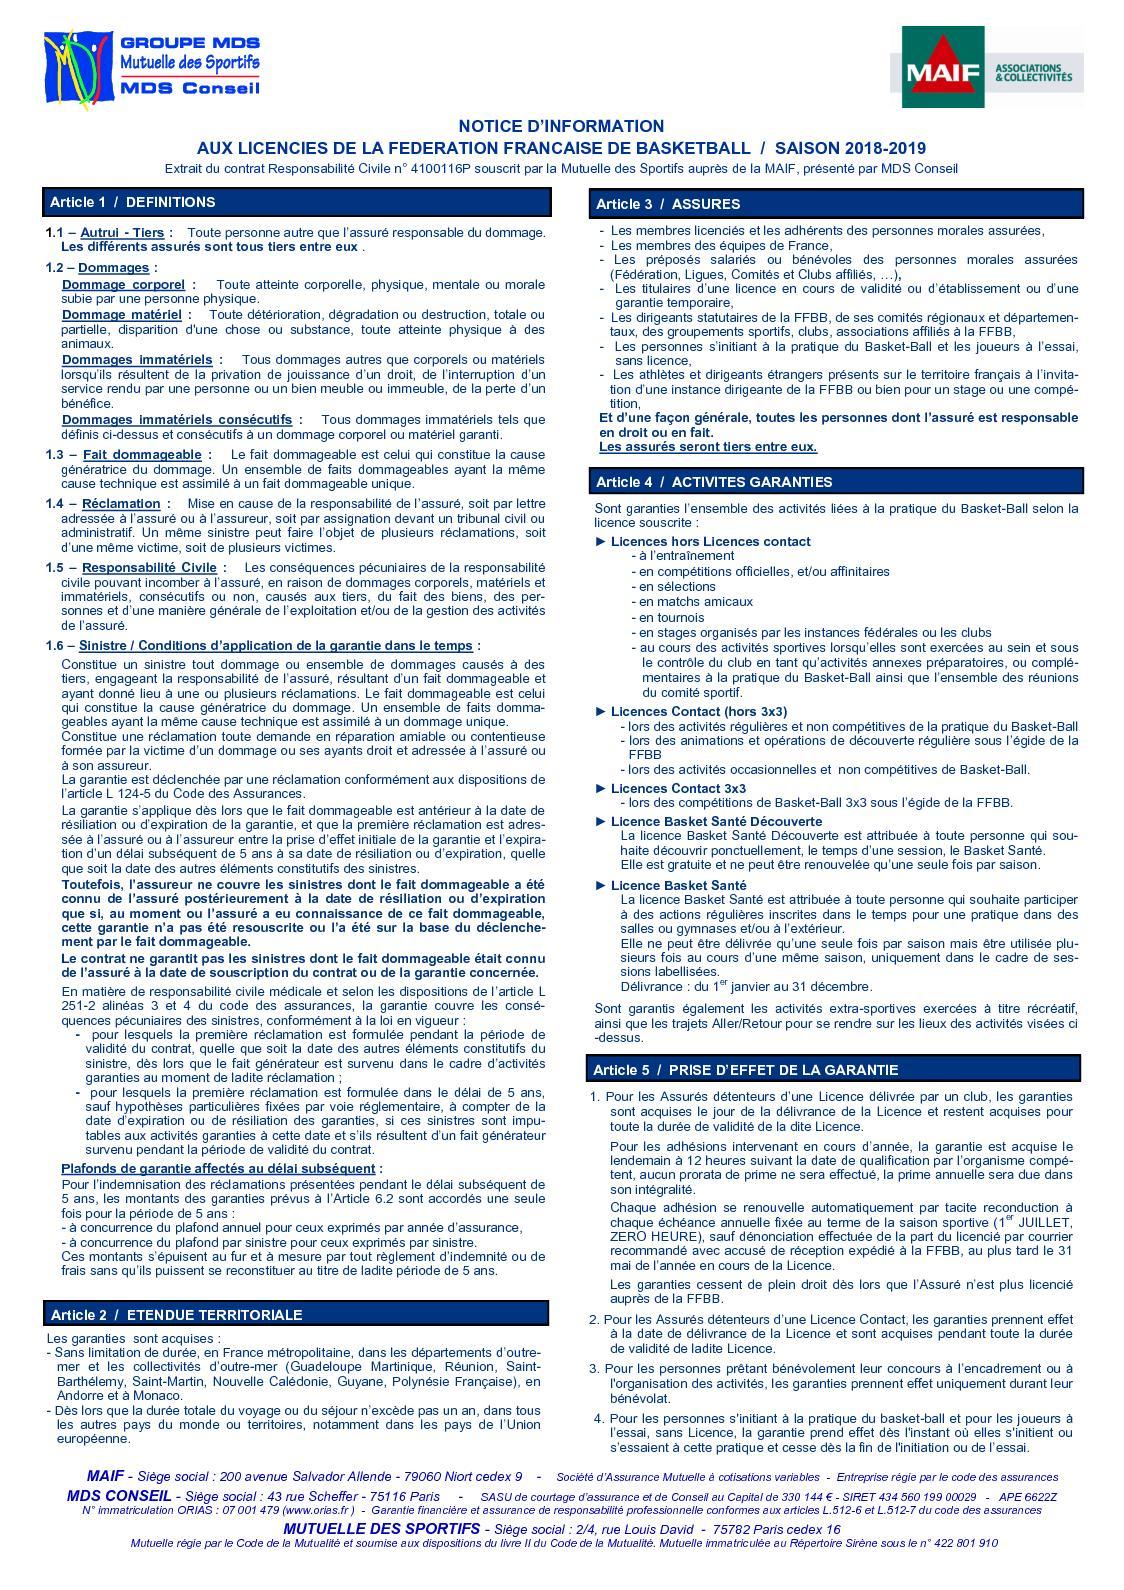 Calaméo - Assurance Licence 07f9749f93cc